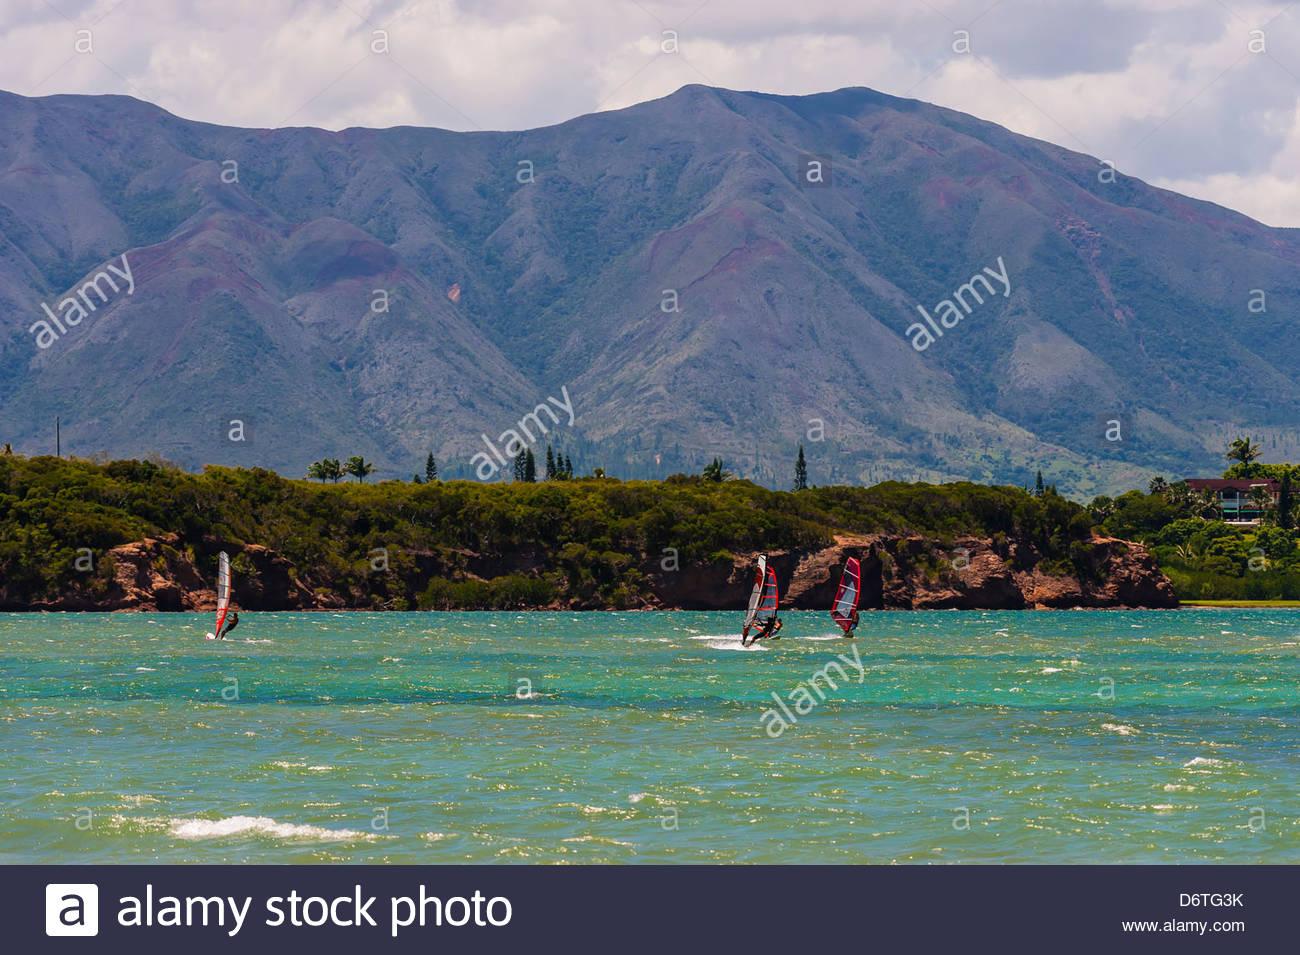 Windsurfing, Magenta Bay, Noumea, Grand Terre, New Caledonia - Stock Image